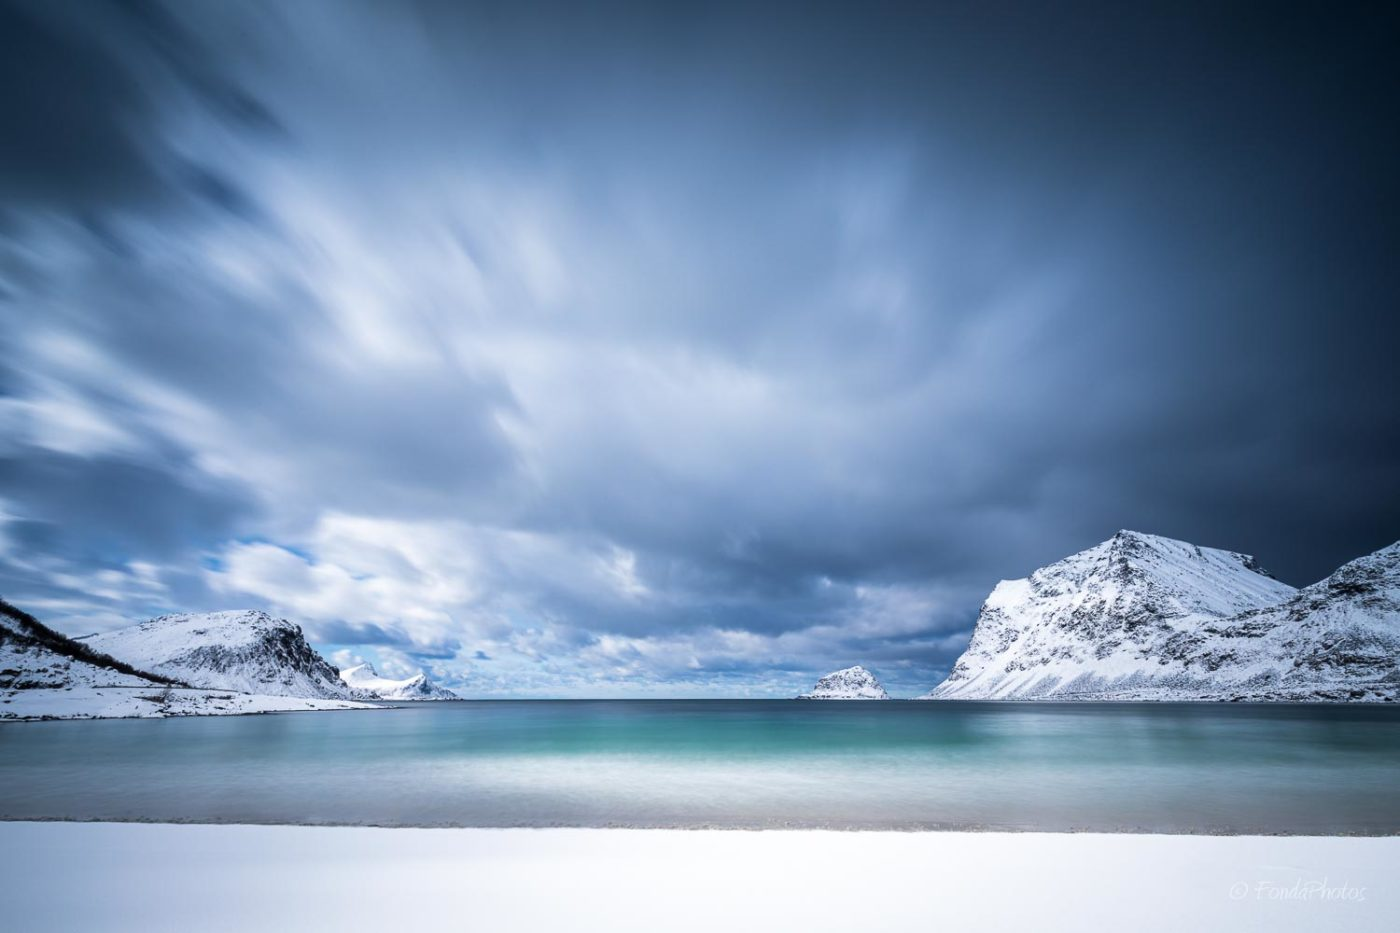 Vikbukta beach, Lofoten